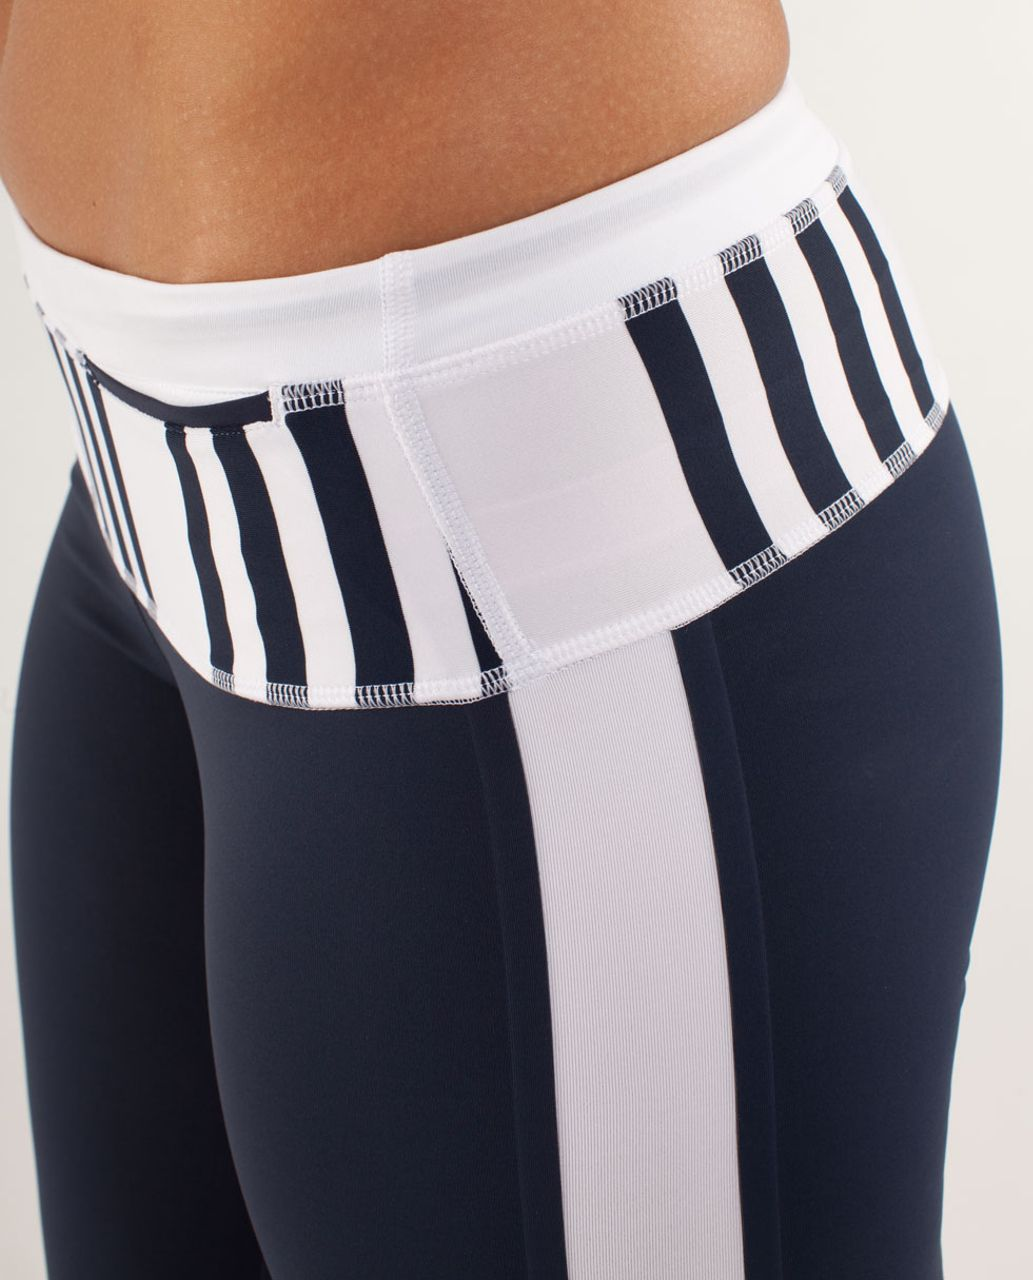 Lululemon Run:  Proceed With Speed Crop - Inkwell / White / Ocean Stripe Inkwell